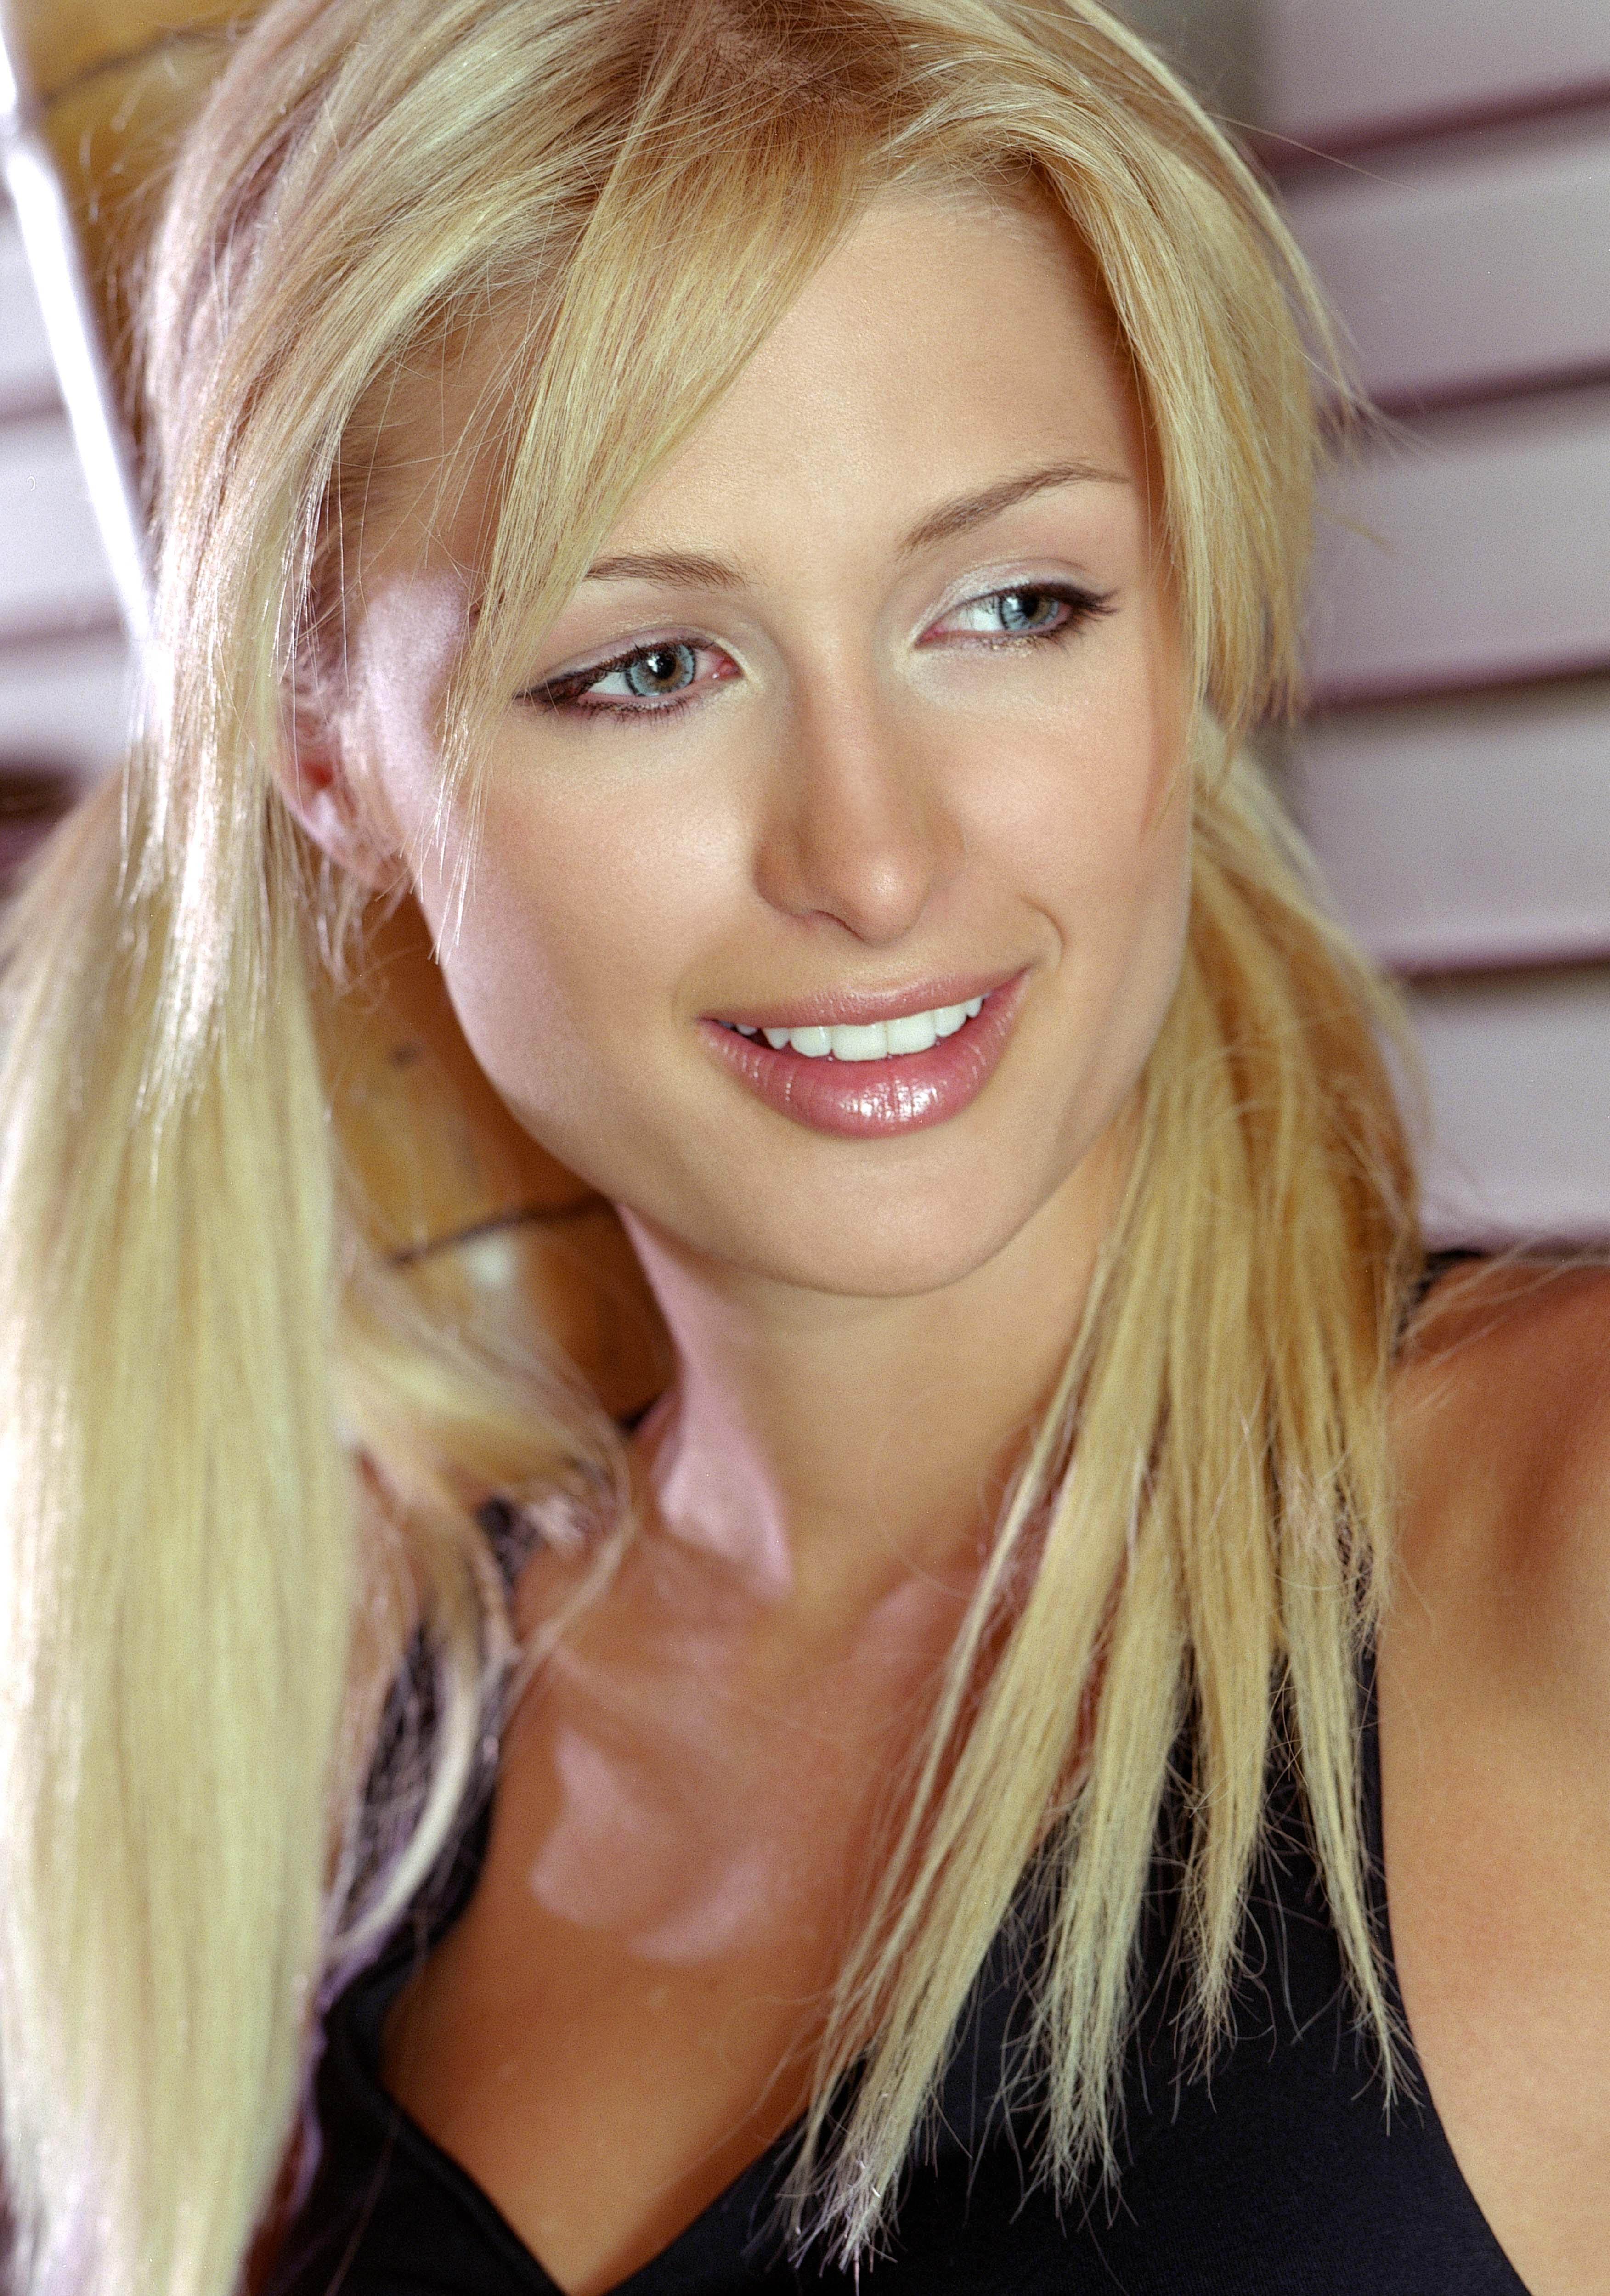 Paris Hilton wallpaper | 3505x4999 | 60127 | WallpaperUP пэрис хилтон